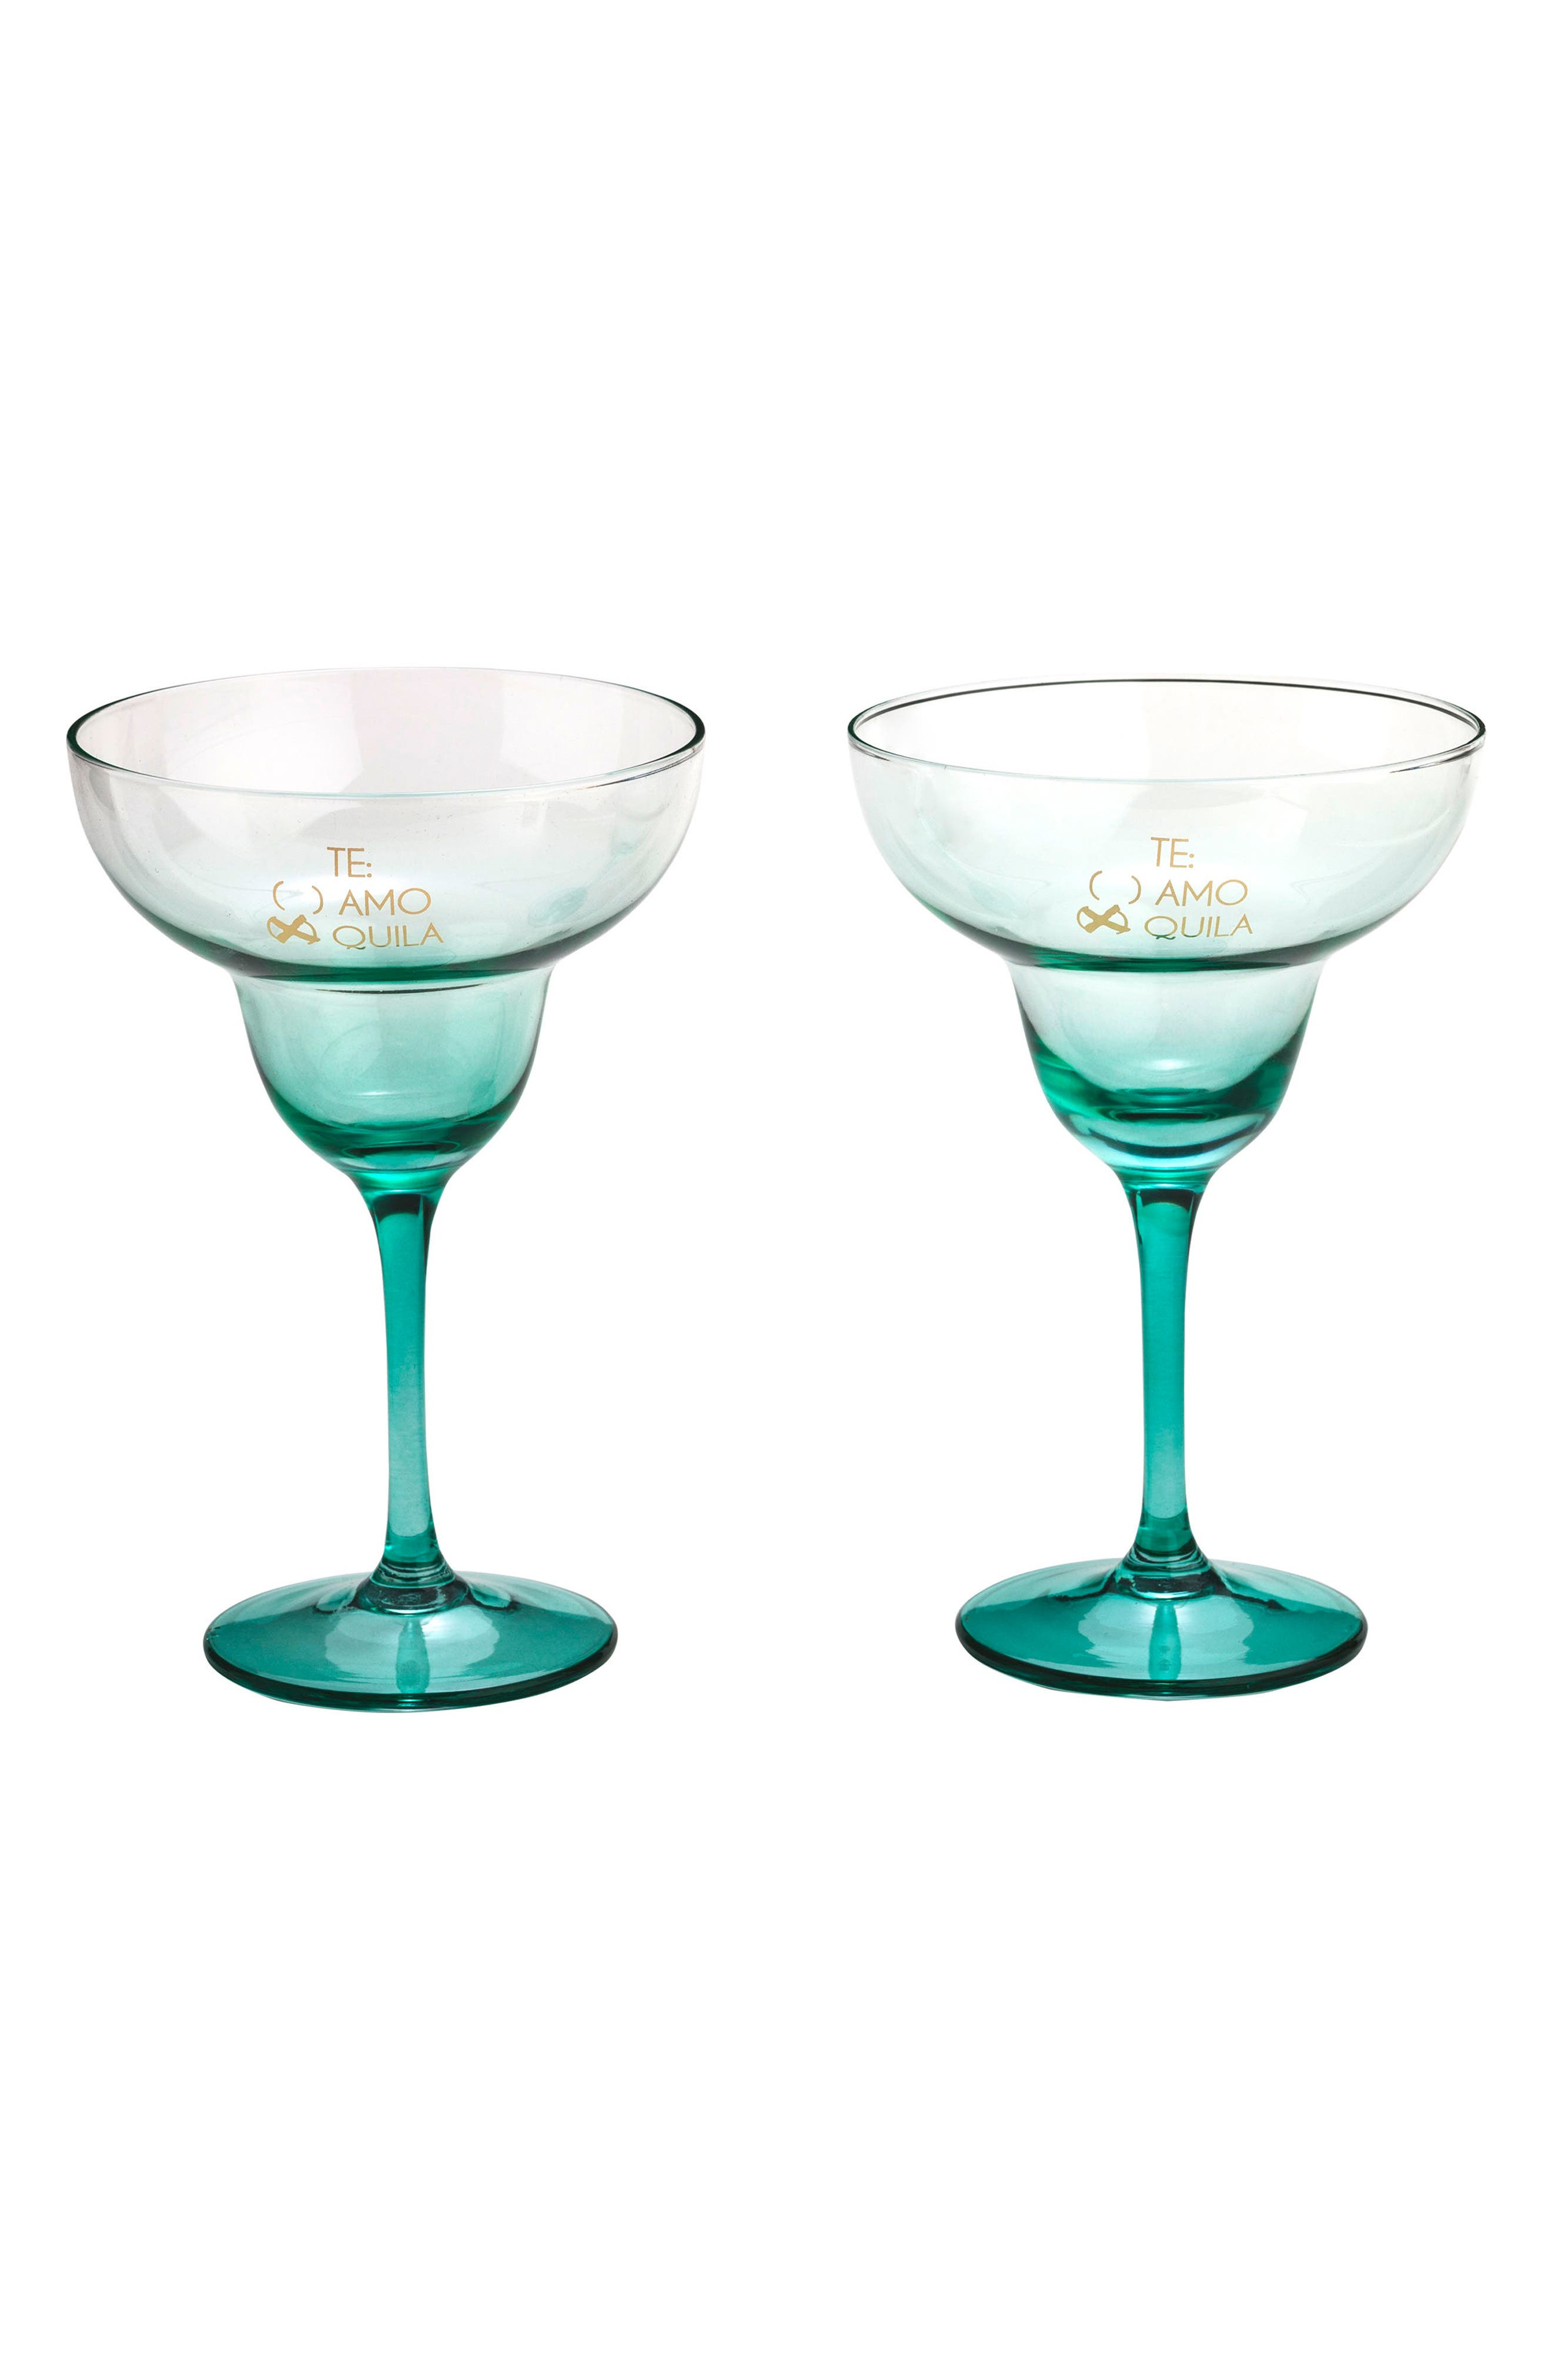 Te Amo x Quila Set of 2 Margarita Glasses,                             Main thumbnail 1, color,                             440